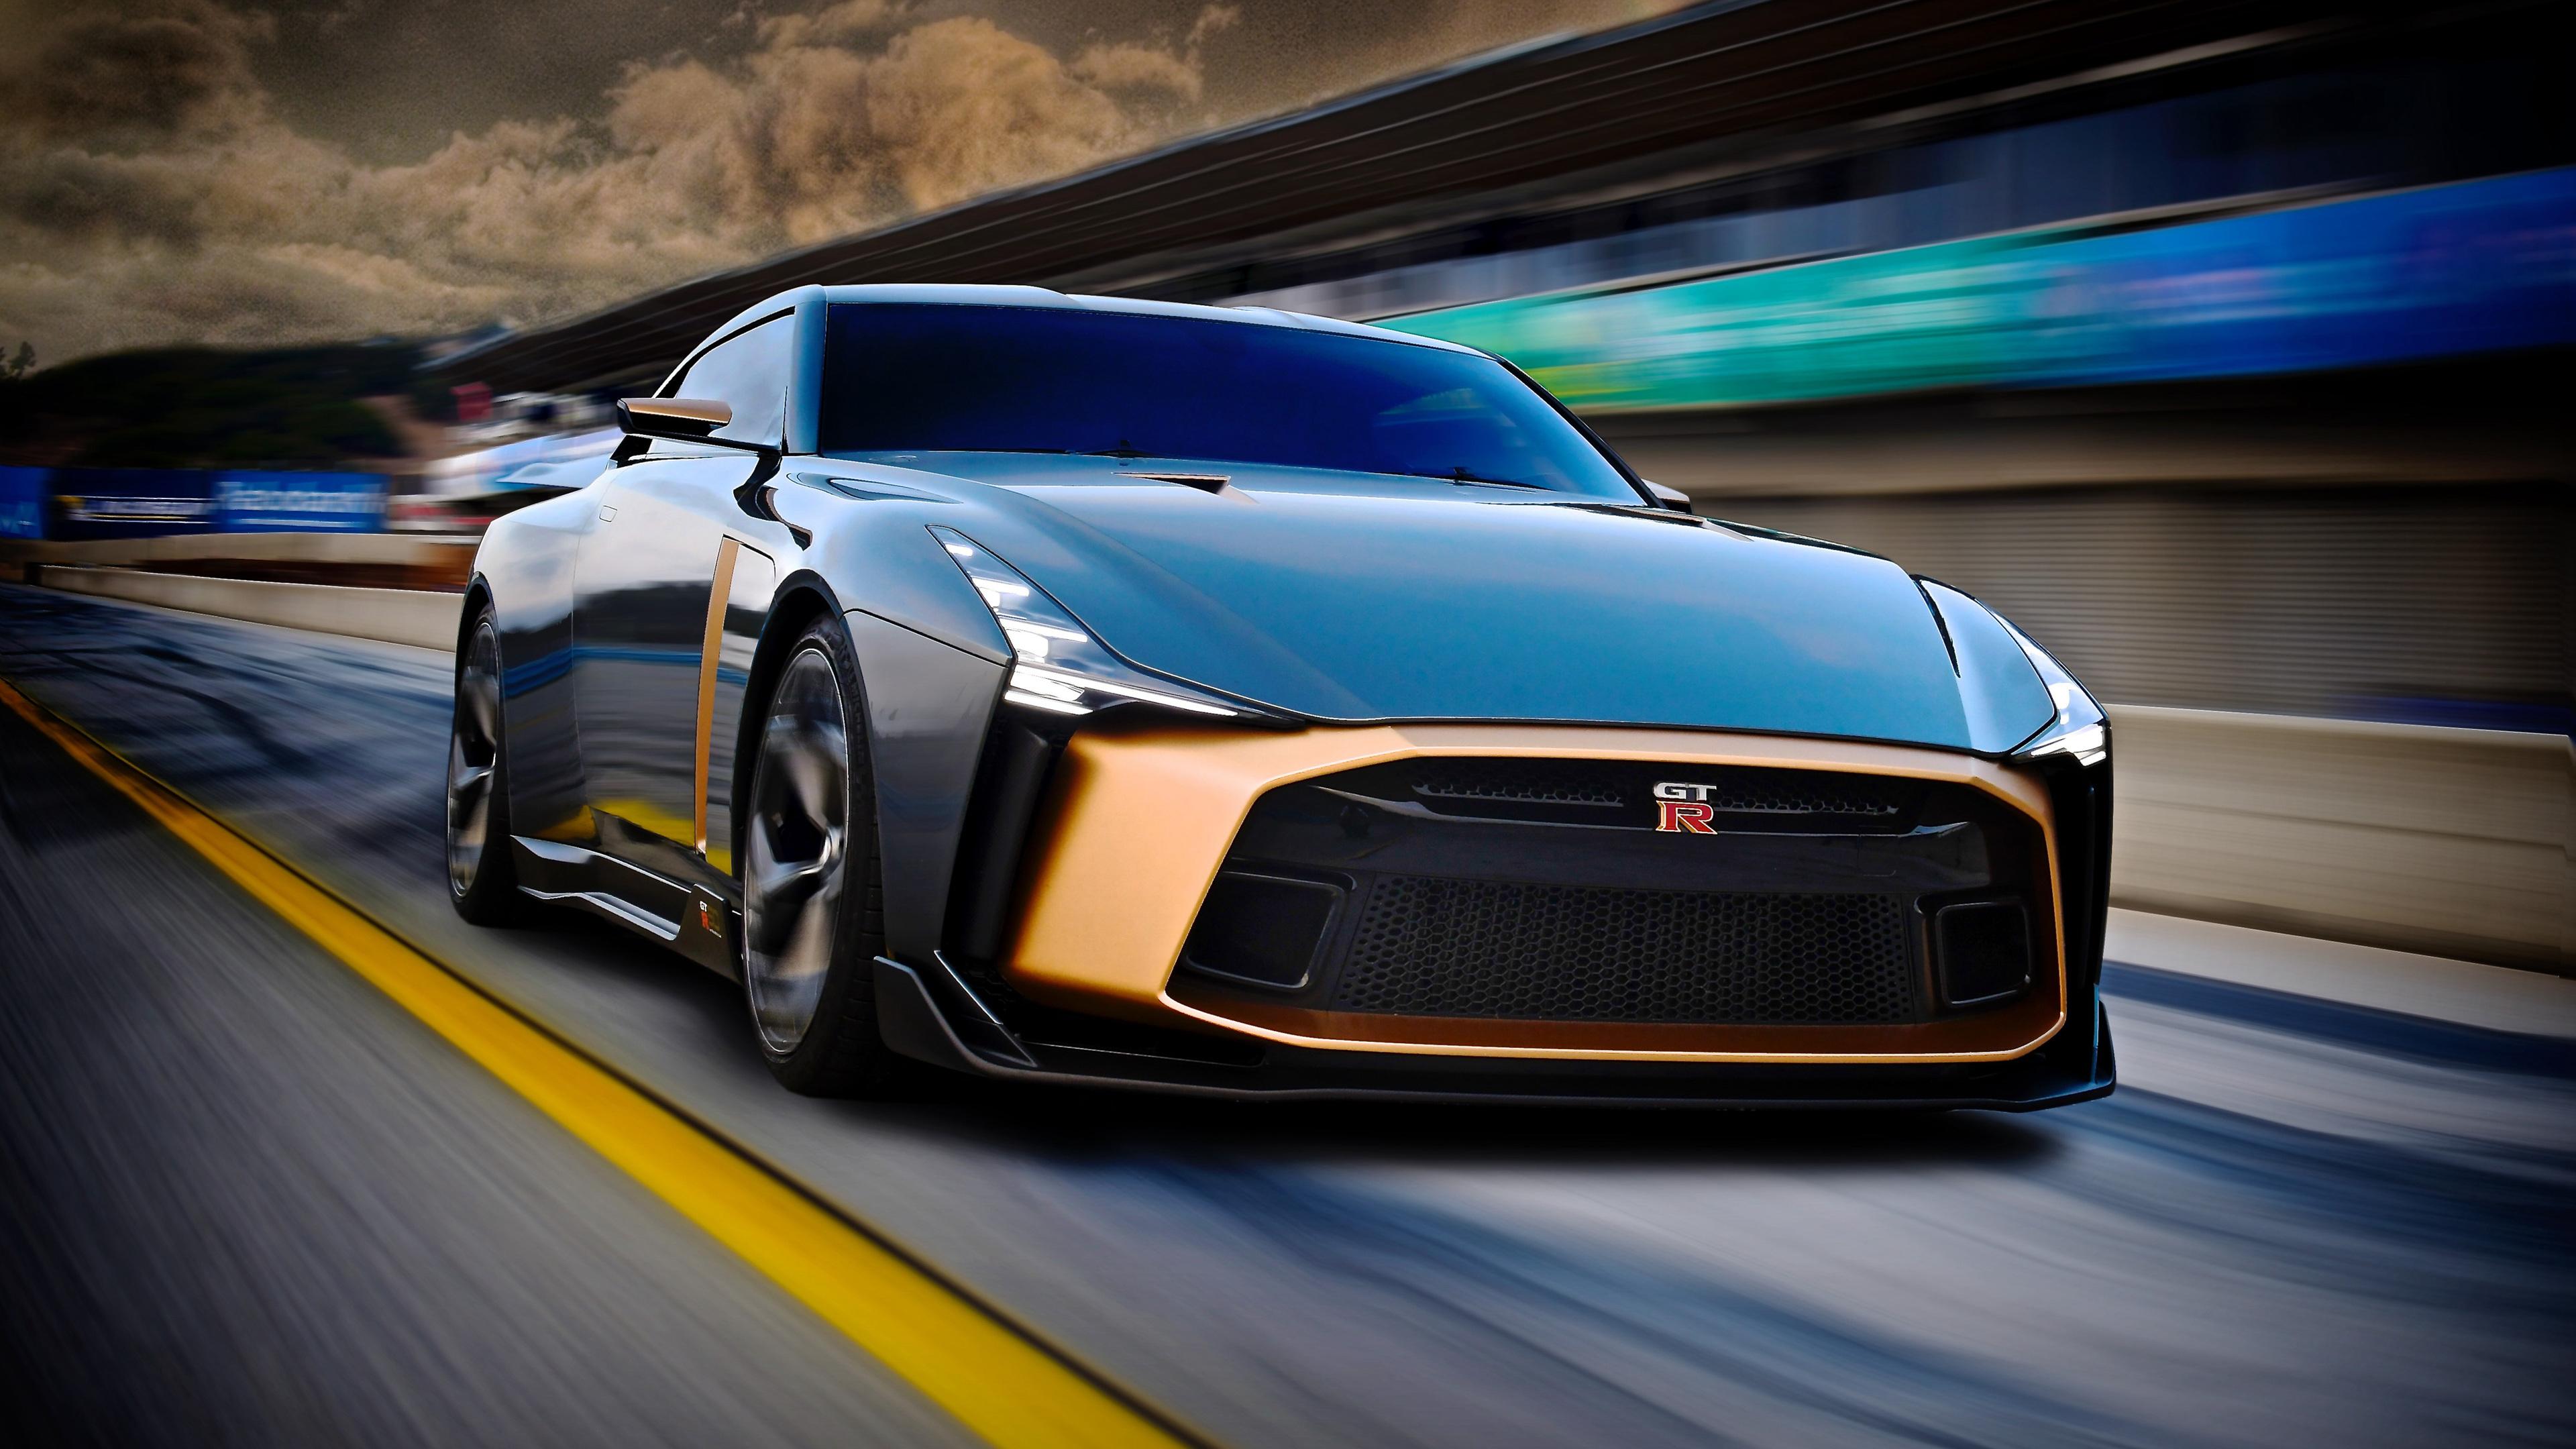 2018 nissan gt r50 concept 1539114268 - 2018 Nissan GT R50 Concept - nissan wallpapers, nissan gt r50 wallpapers, hd-wallpapers, concept cars wallpapers, 4k-wallpapers, 2018 cars wallpapers